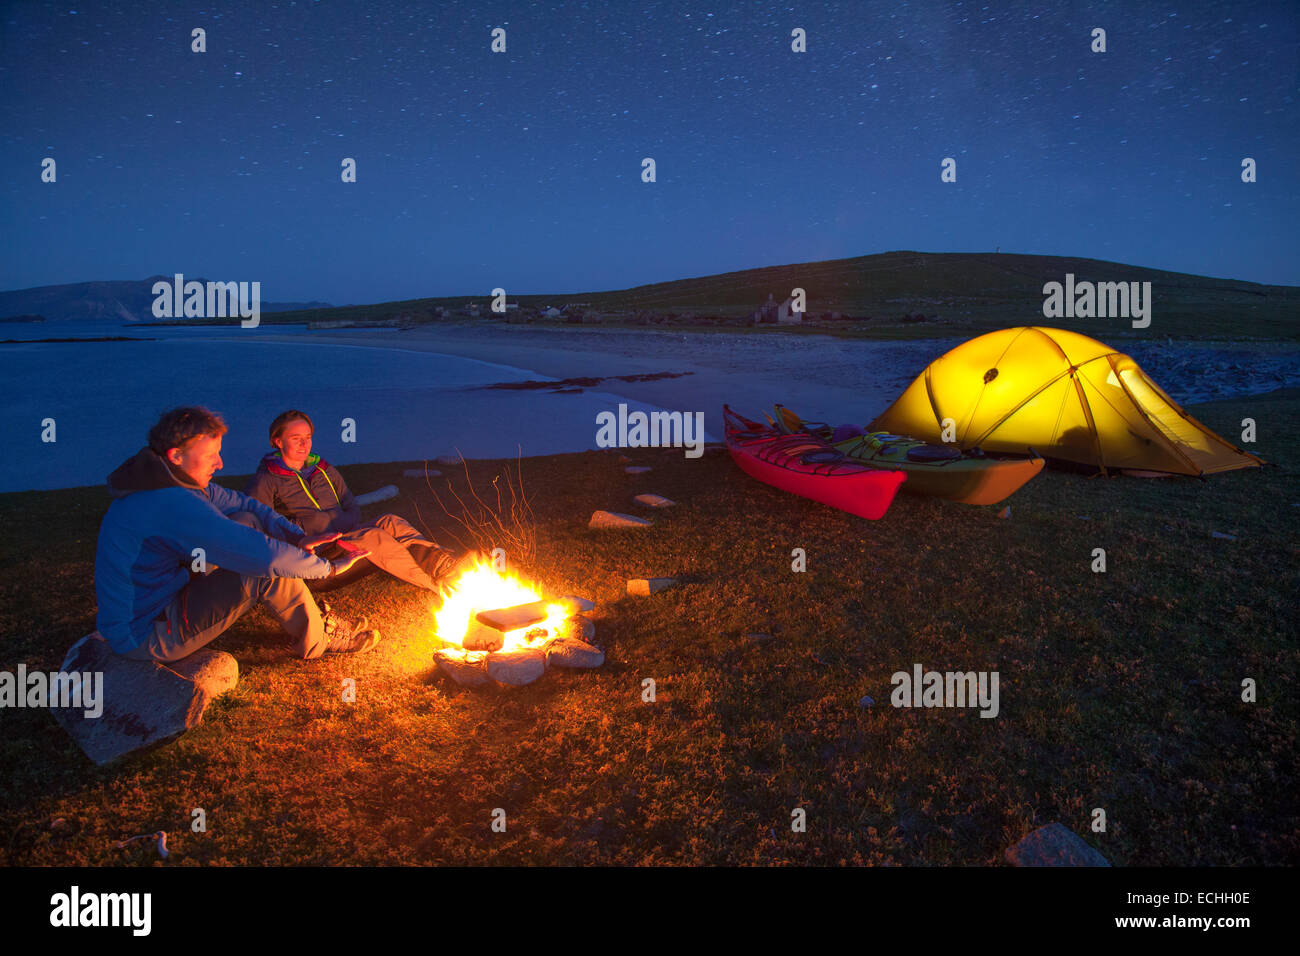 Sea kayakers enjoying an evening campfire on Inishkea South Island, County Mayo, Ireland. - Stock Image